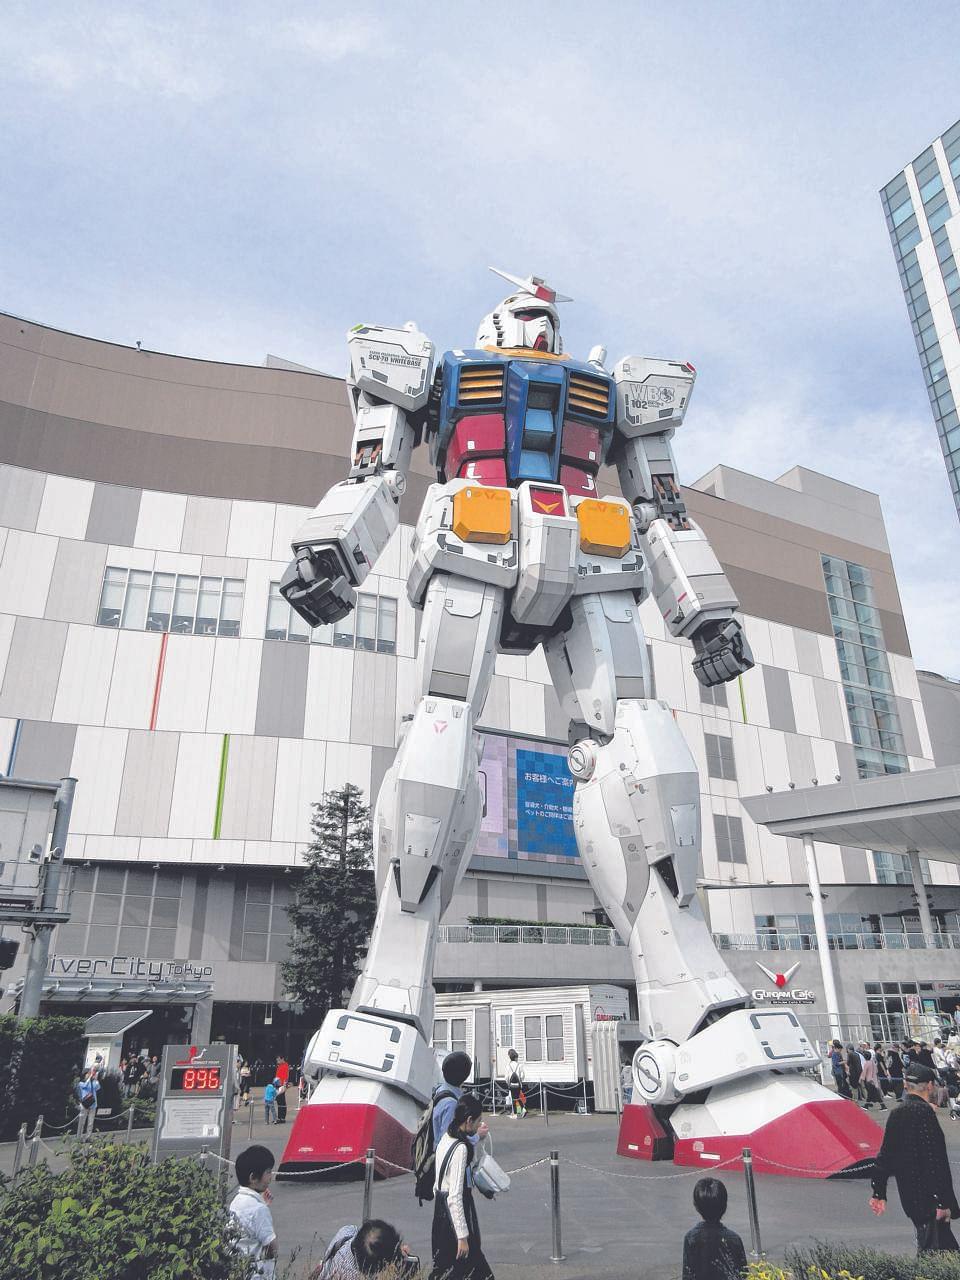 Top Manga 2020.Japan S Anime Power East Asia News Top Stories The Straits Times